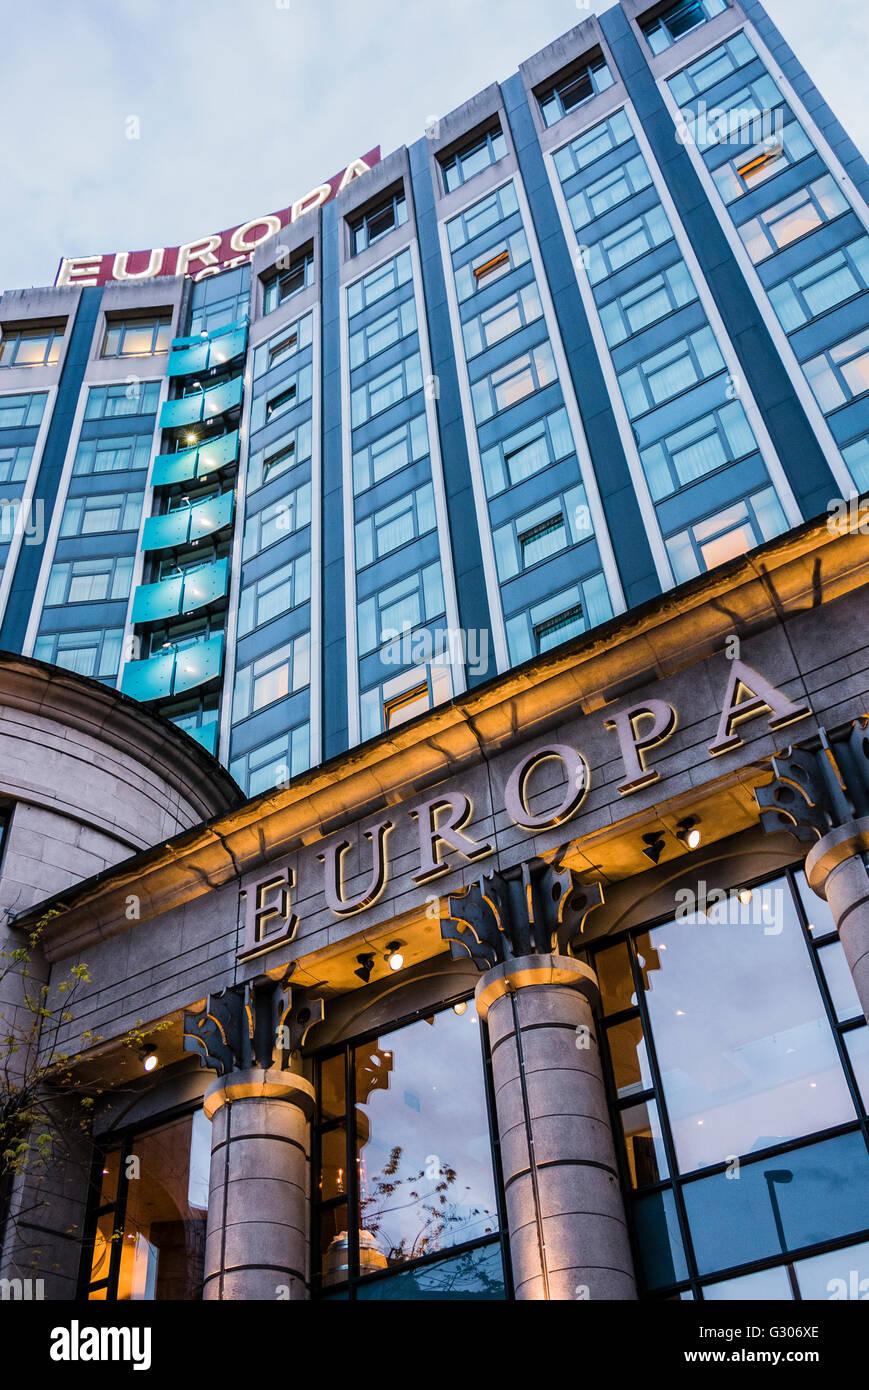 Europa Hotel, Belfast - Stock Image